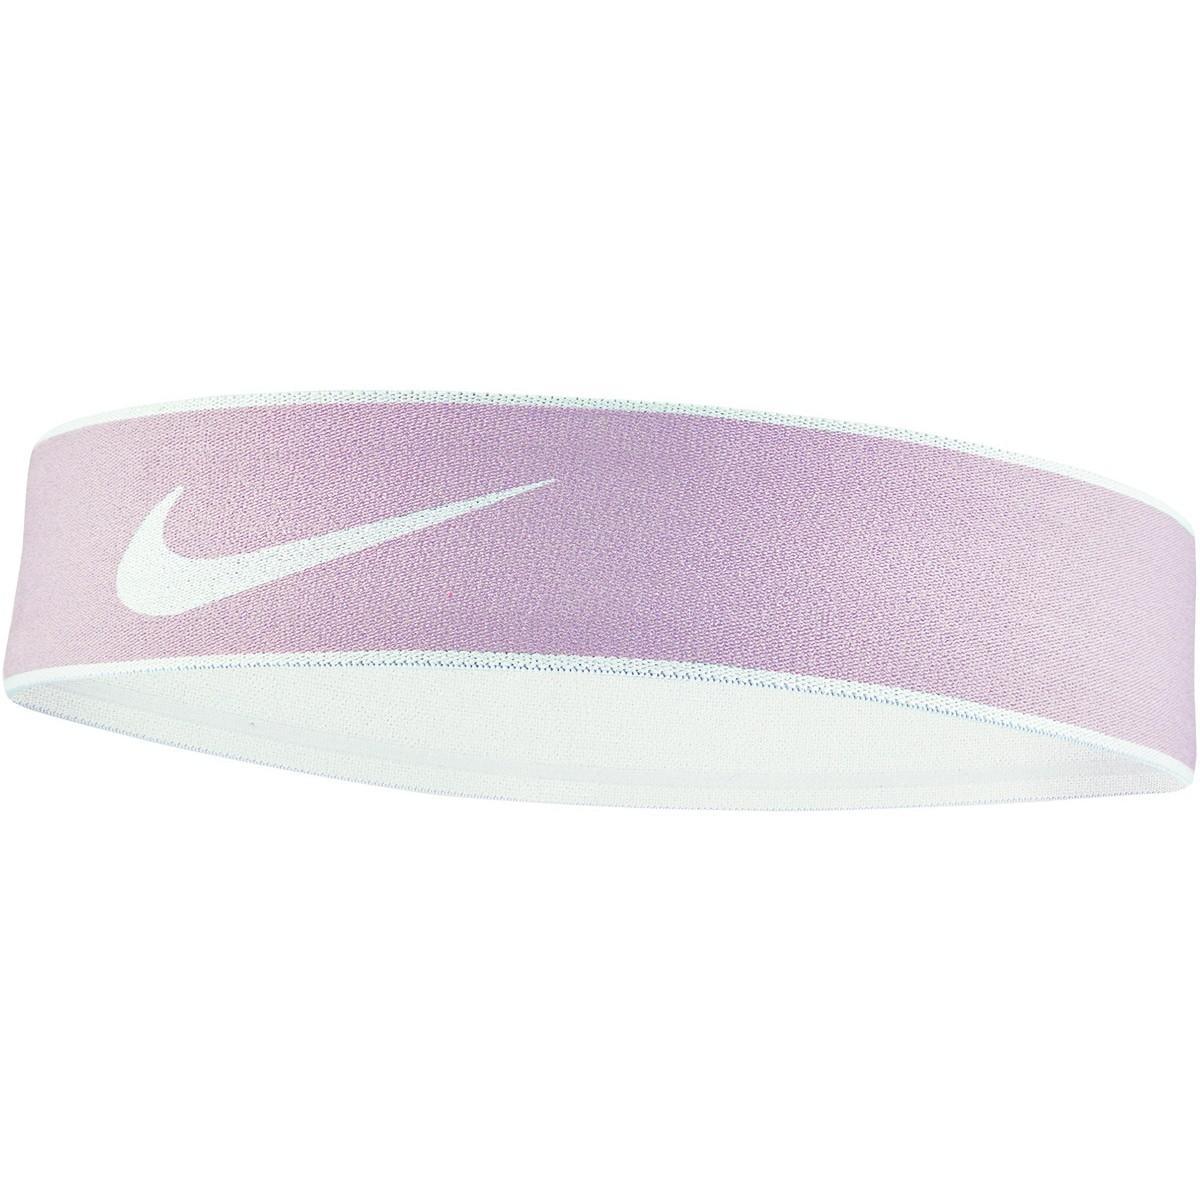 Повязка на голову Nike Pro Swoosh 2.0 Headband pink/black